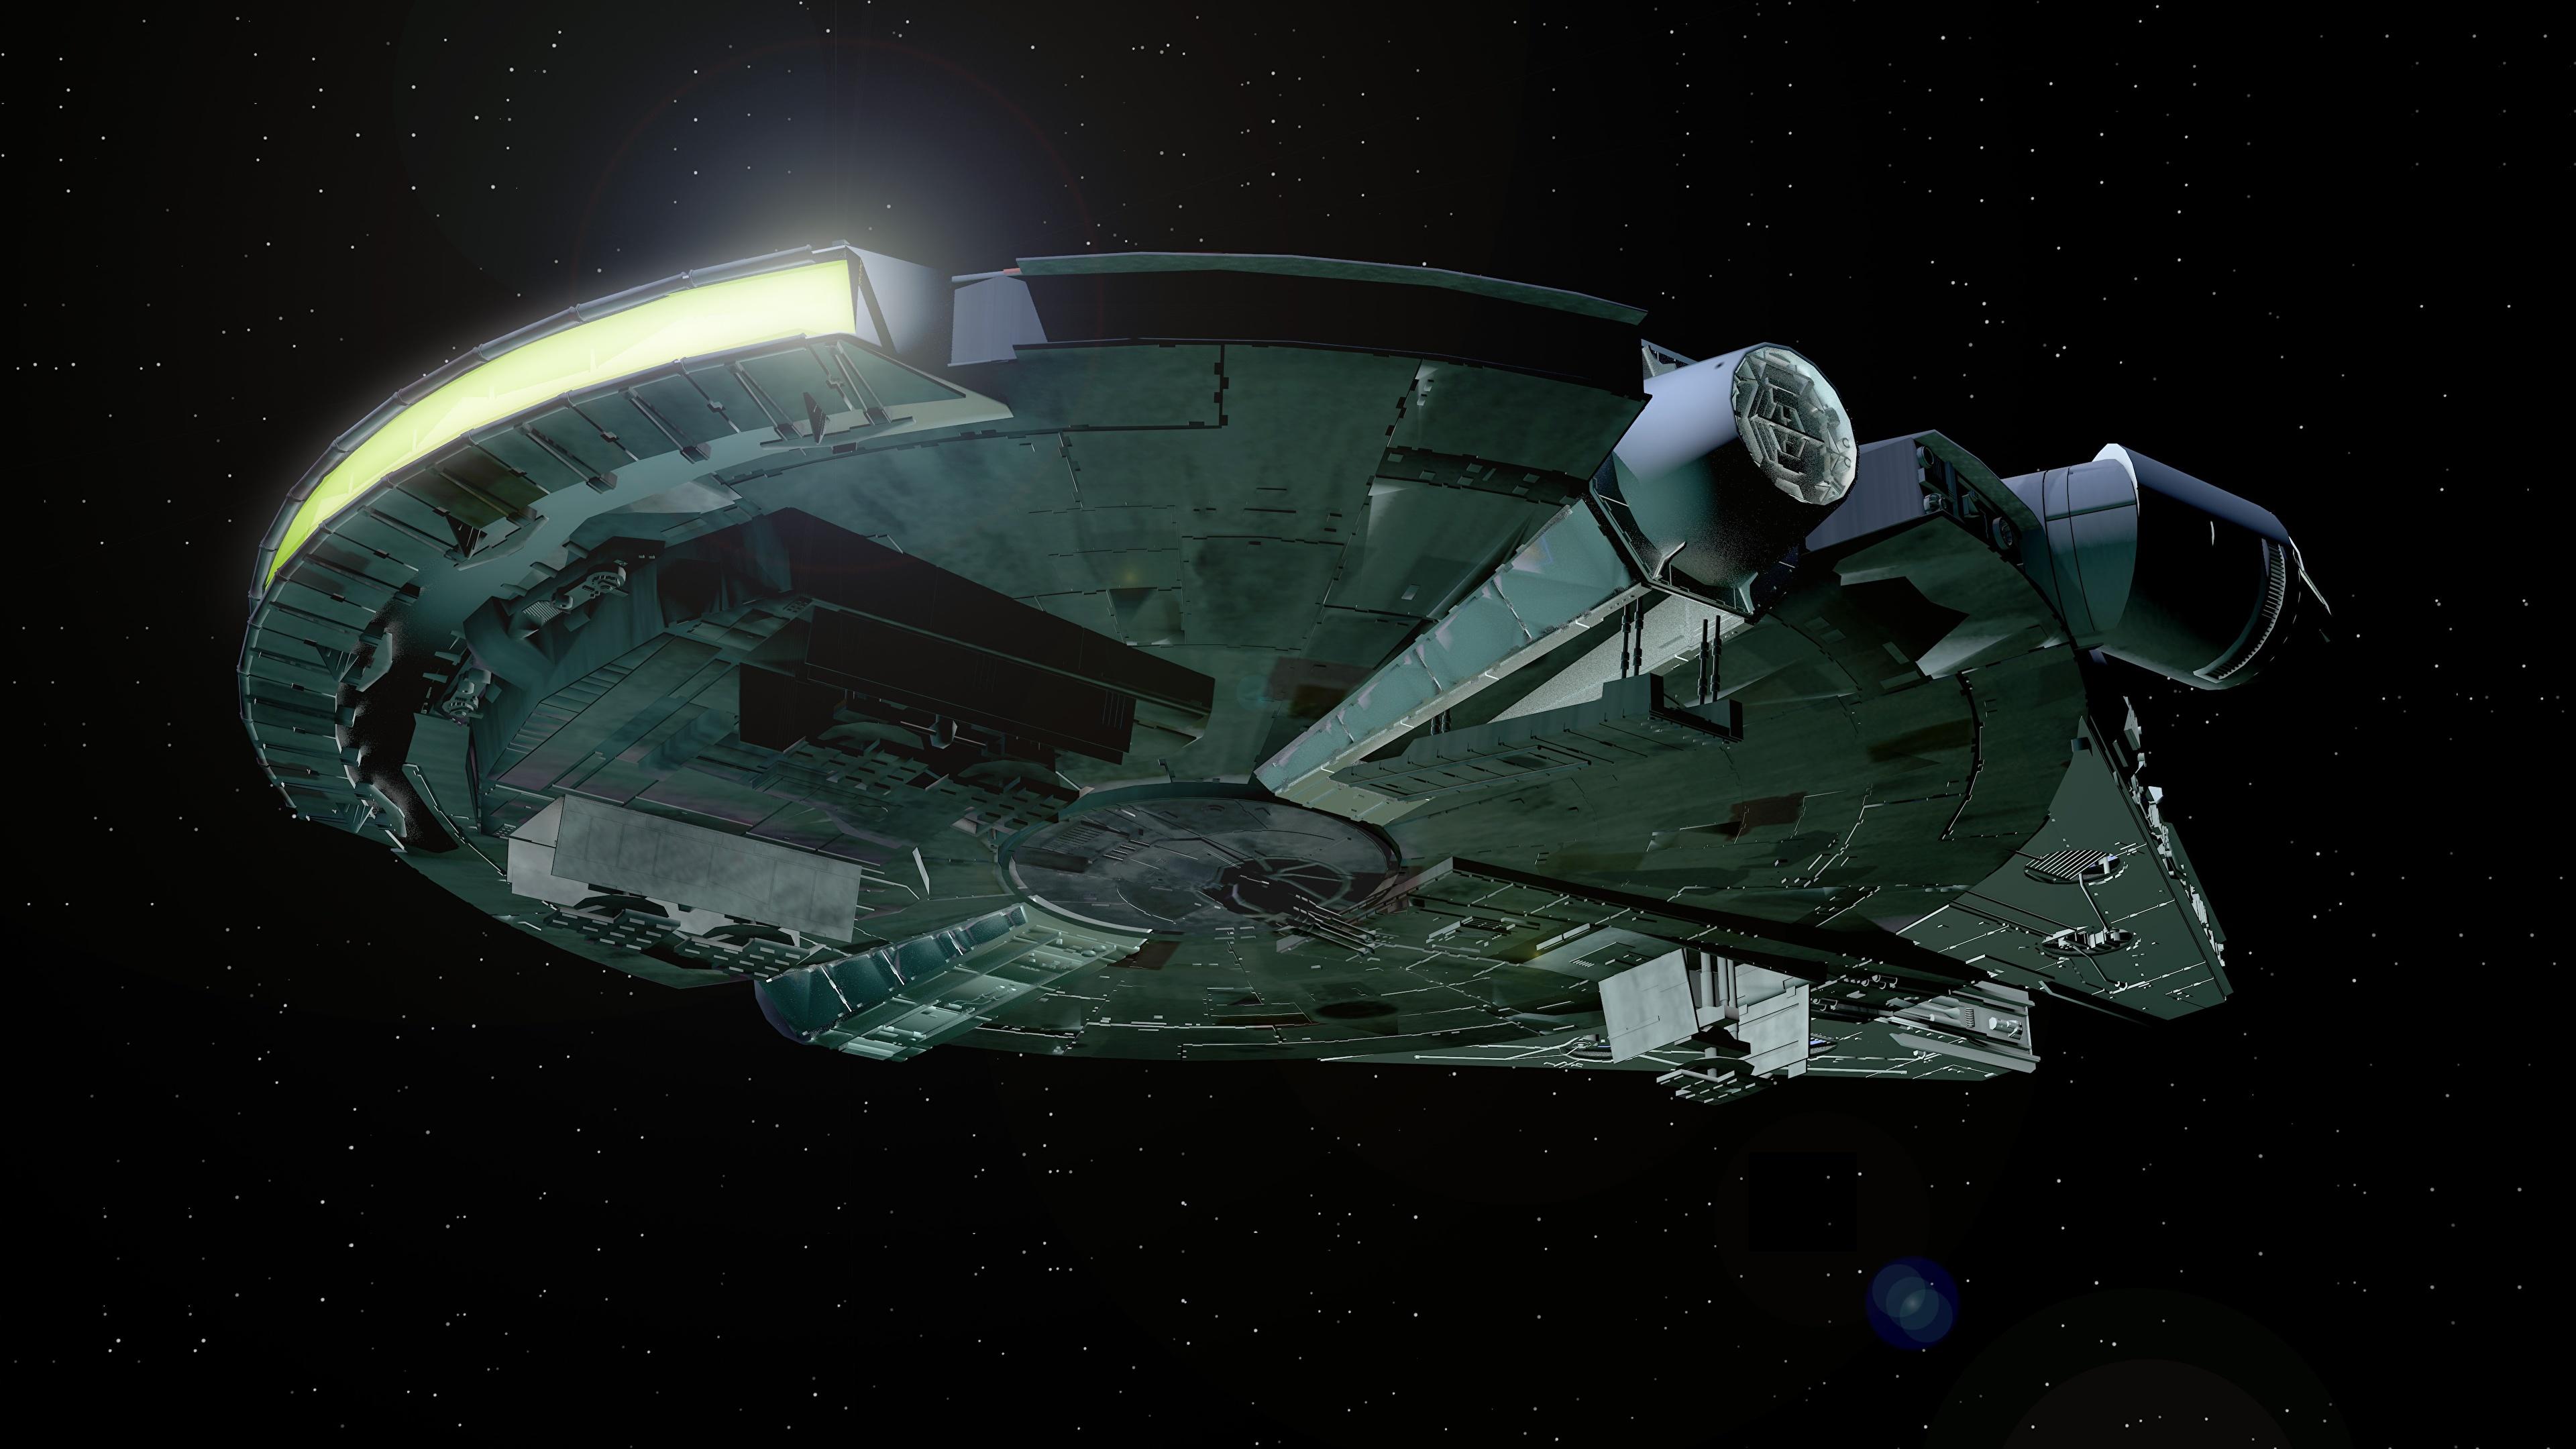 Desktop Wallpapers Star Wars Movies Starship Millennium 3840x2160